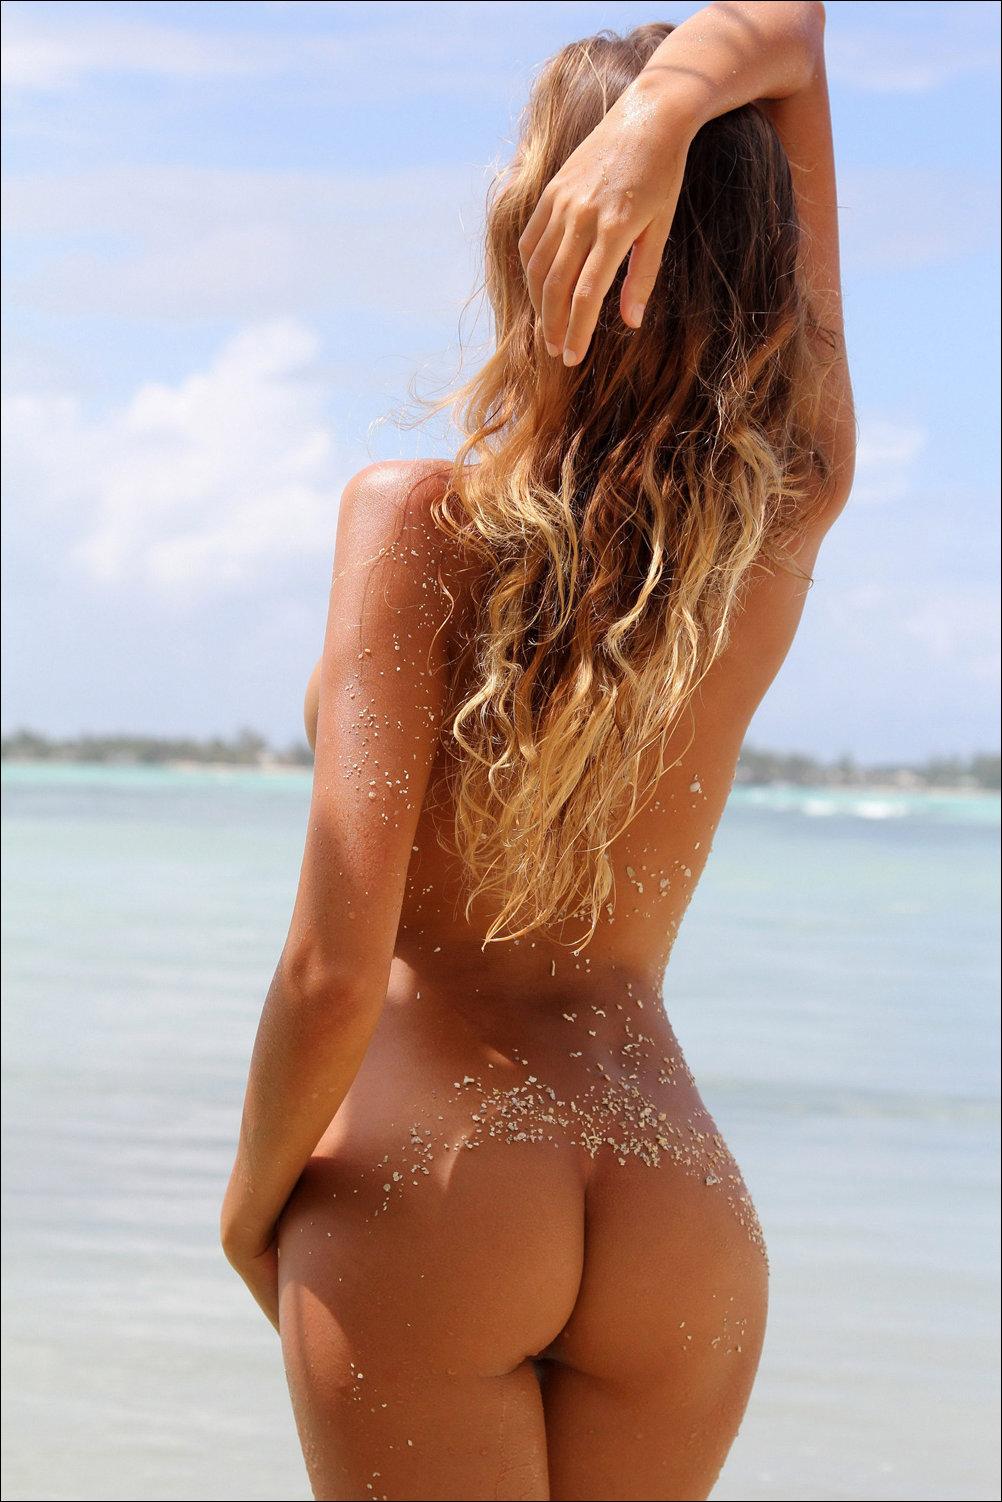 Perfect ass naked women — img 2